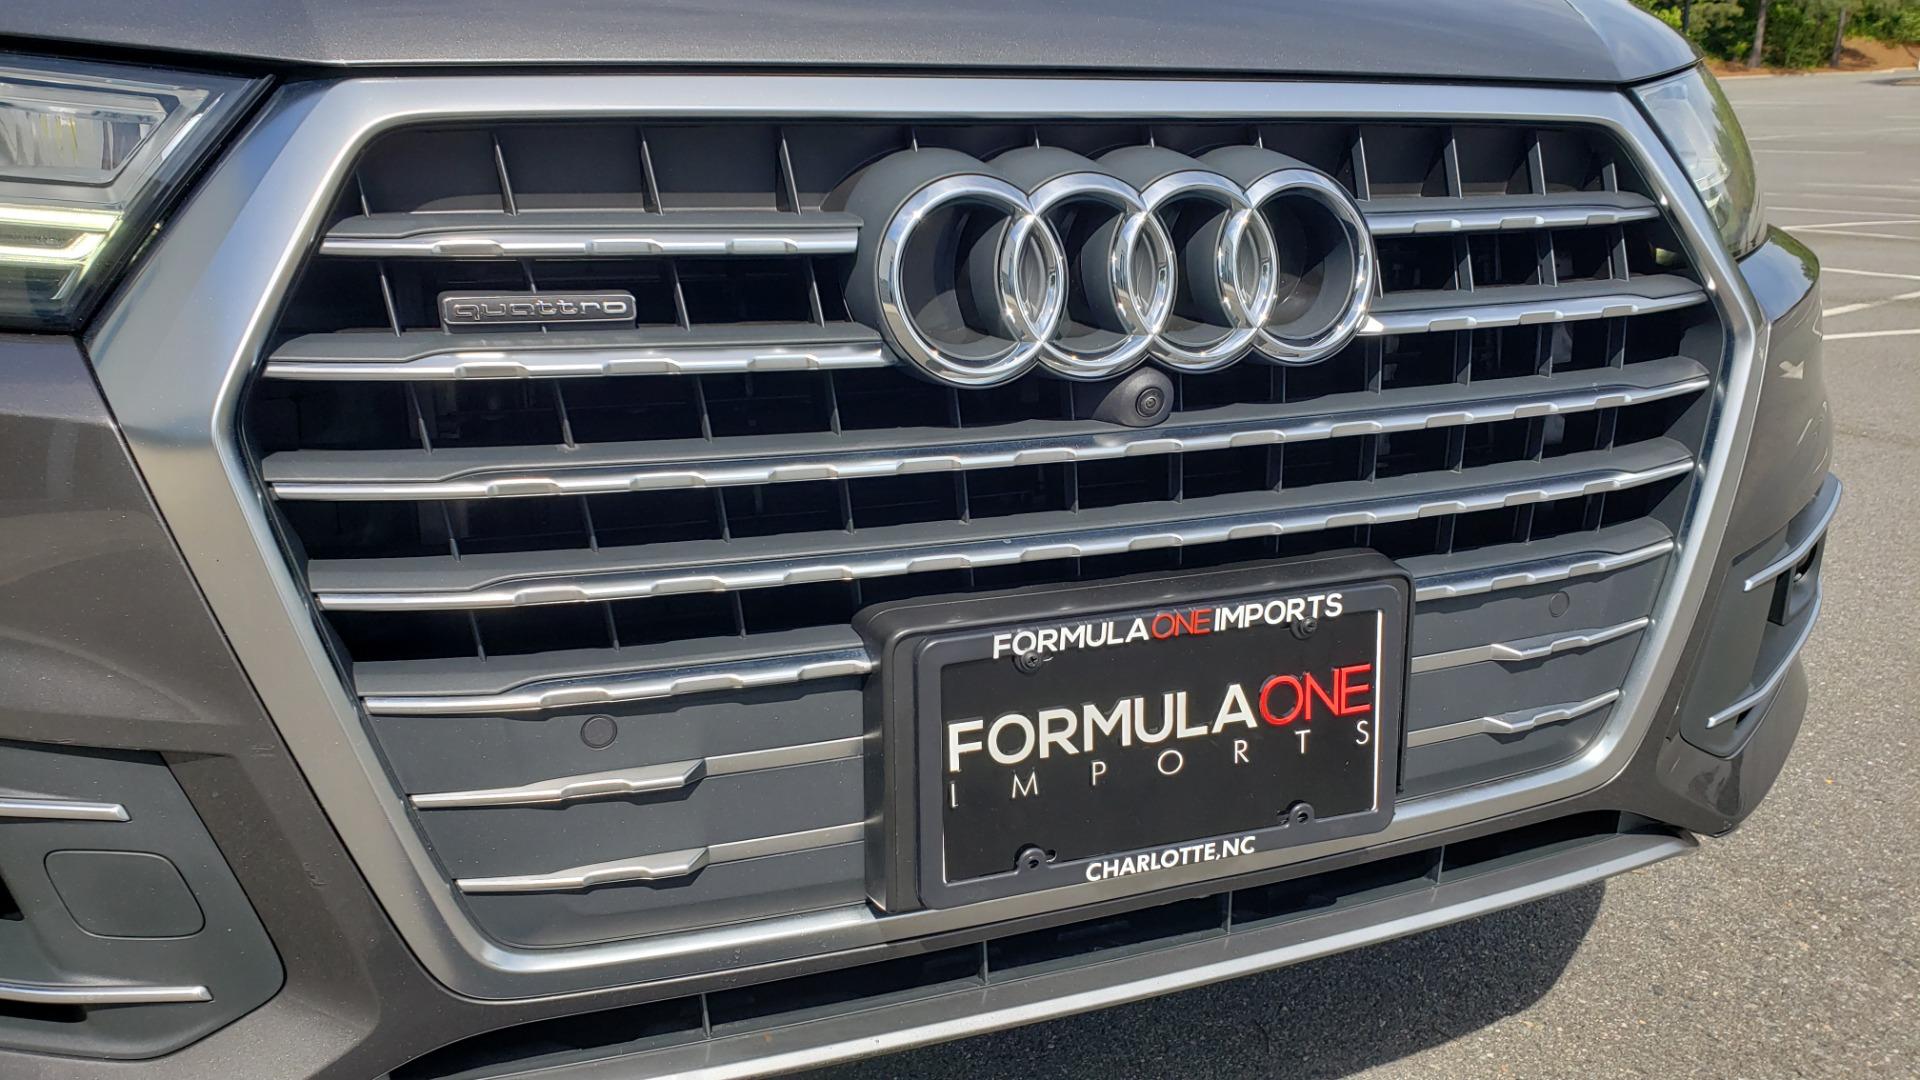 Used 2018 Audi Q7 PRESTIGE TIPTRONIC / NAV / SUNROOF / ADAPTIVE PKG / DRVR ASST / CLD WTHR /  for sale $49,995 at Formula Imports in Charlotte NC 28227 20